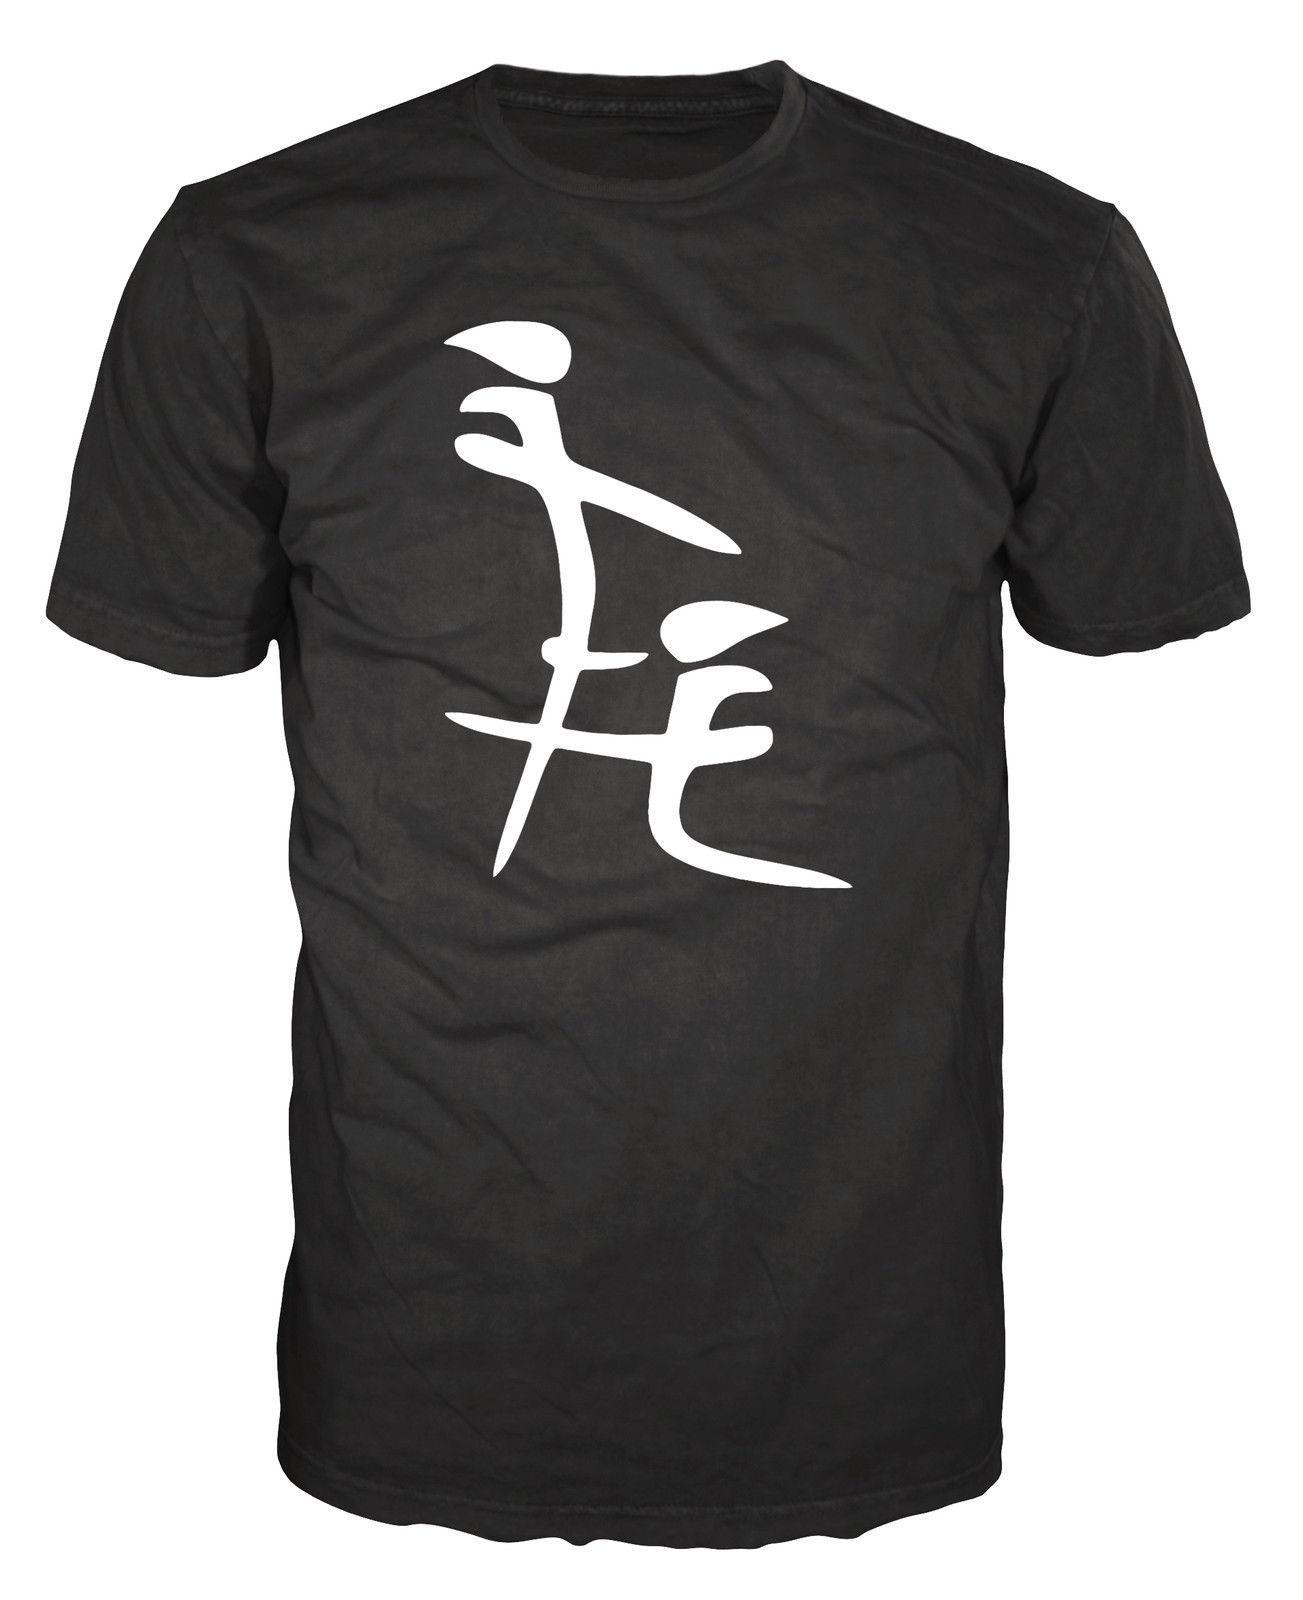 Chinese Symbols Blowjob Funny Joke Prank Offensive Rude T Shirt